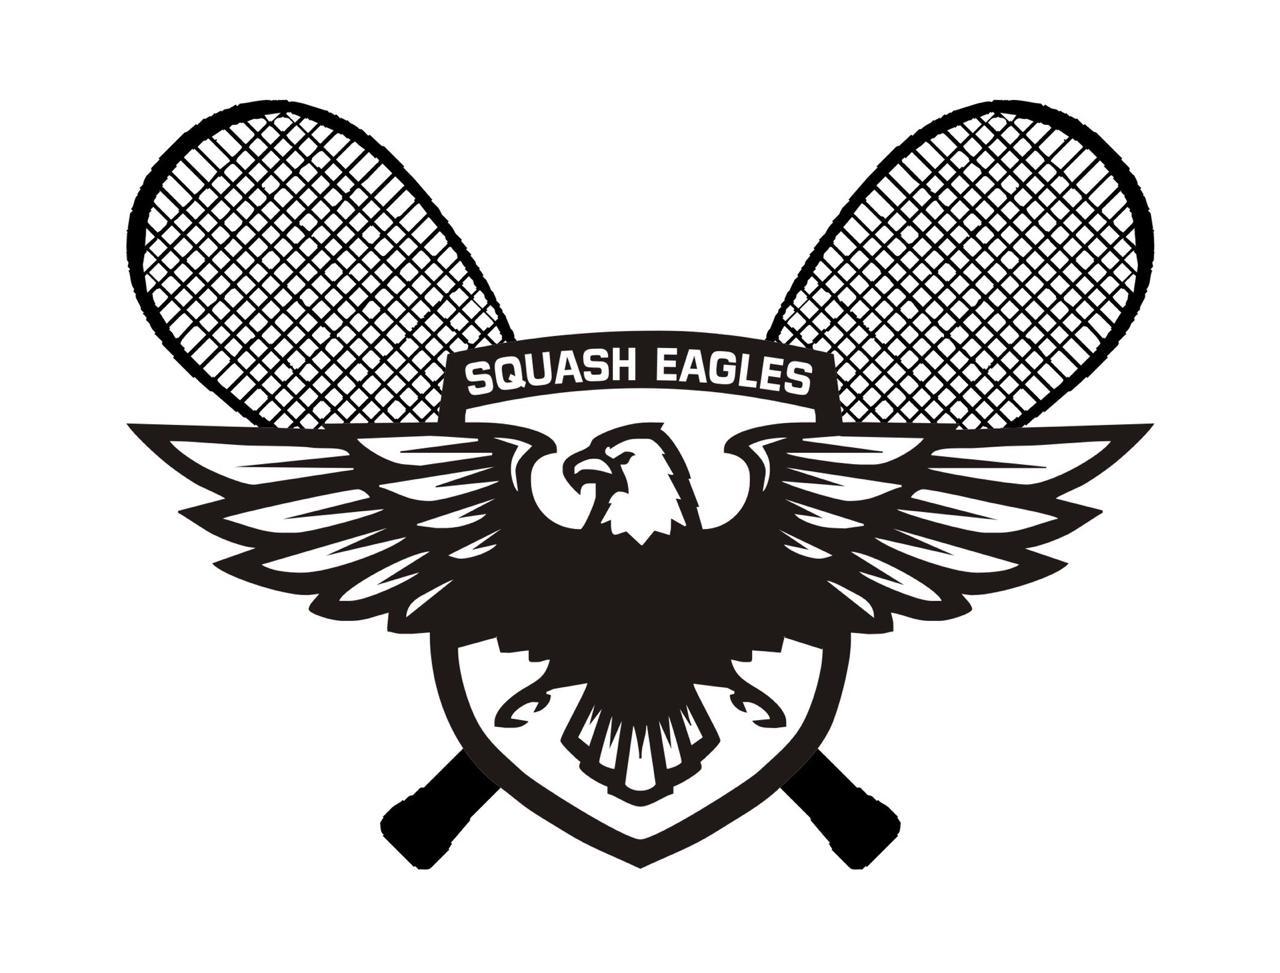 logo for Squash Eagles